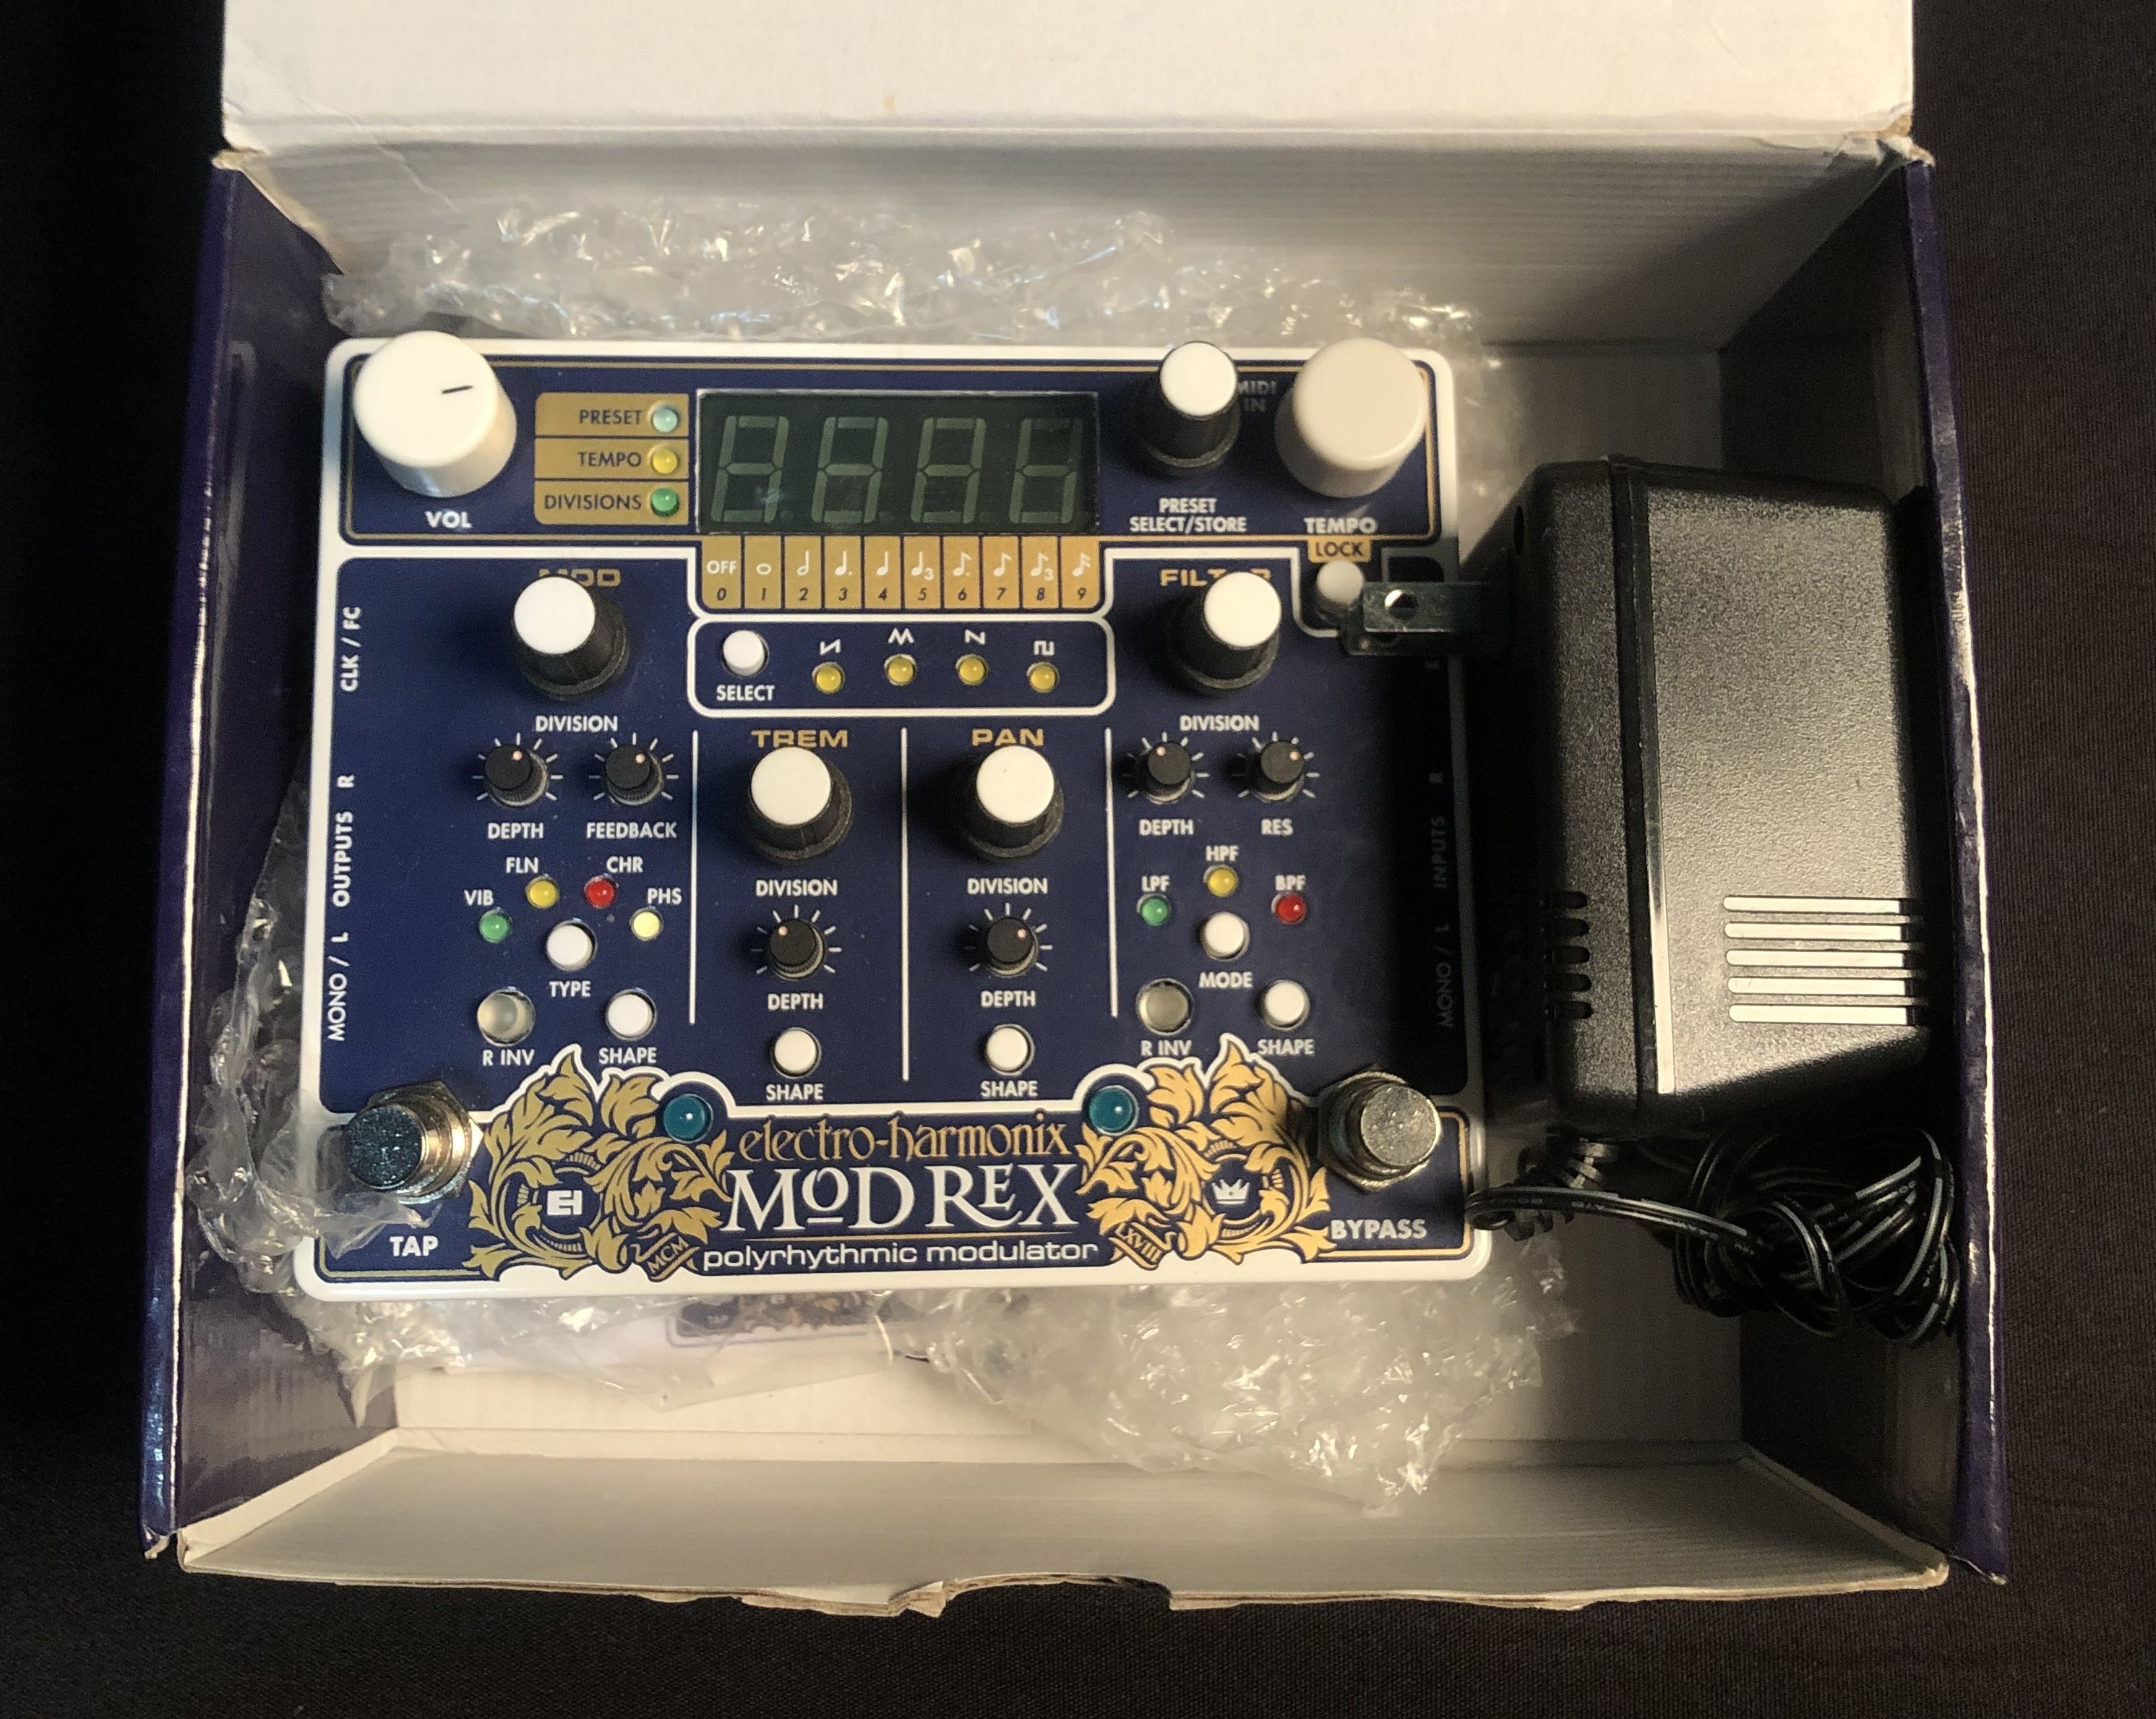 ELECTRO-HARMONIX - Mod Rex Polyrhythmic Modulator Pedal